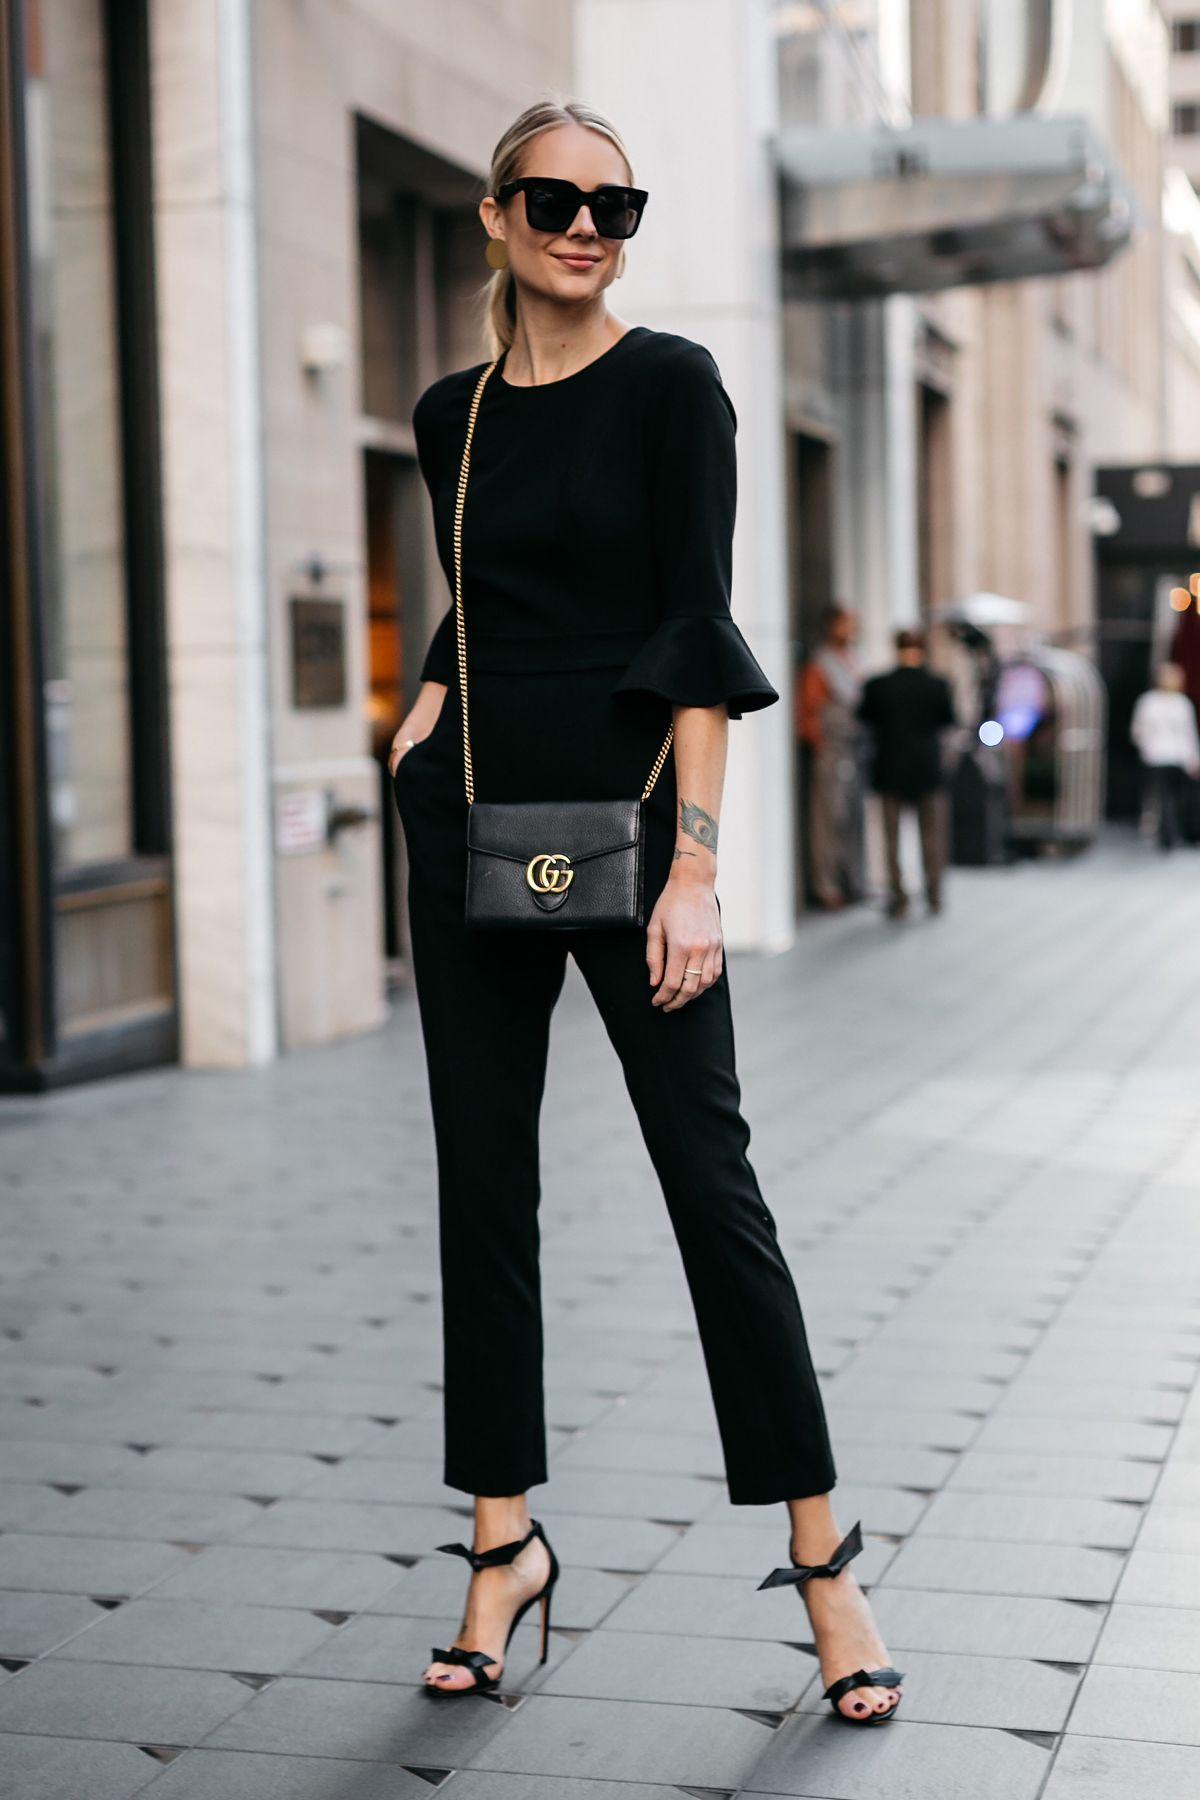 58f03872728 ... Ruffle Sleeve Jumpsuit Gucci Marmont Black Handbag Black Bow Tie Heels  Gold Disc Earrings Black Celine Sunglasses Fashion Jackson Dallas Blogger  Fashion ...